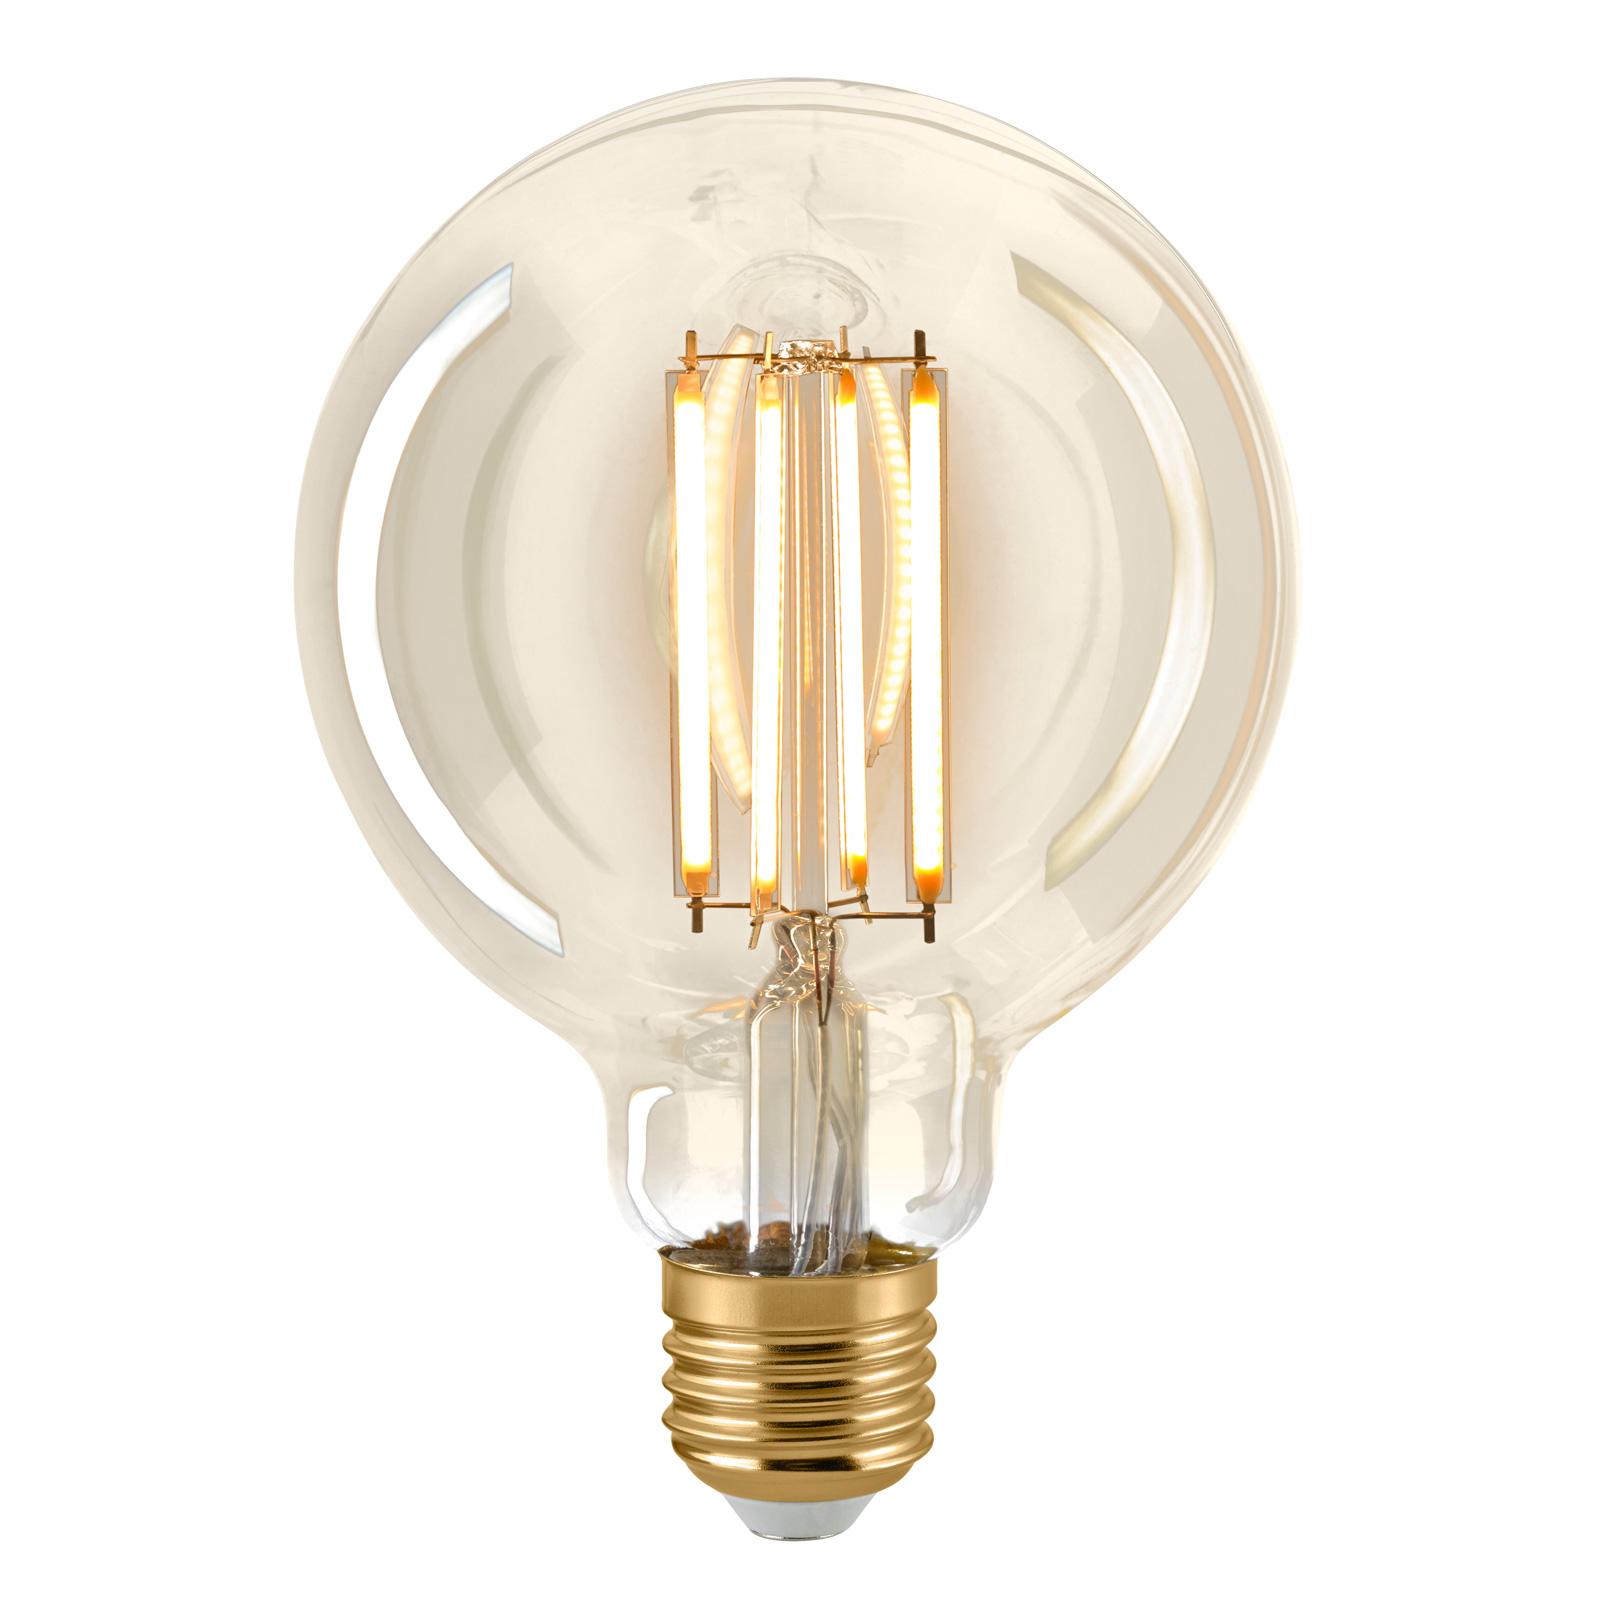 LED-Lampe E27 G95 4,5W Filament Globe gold